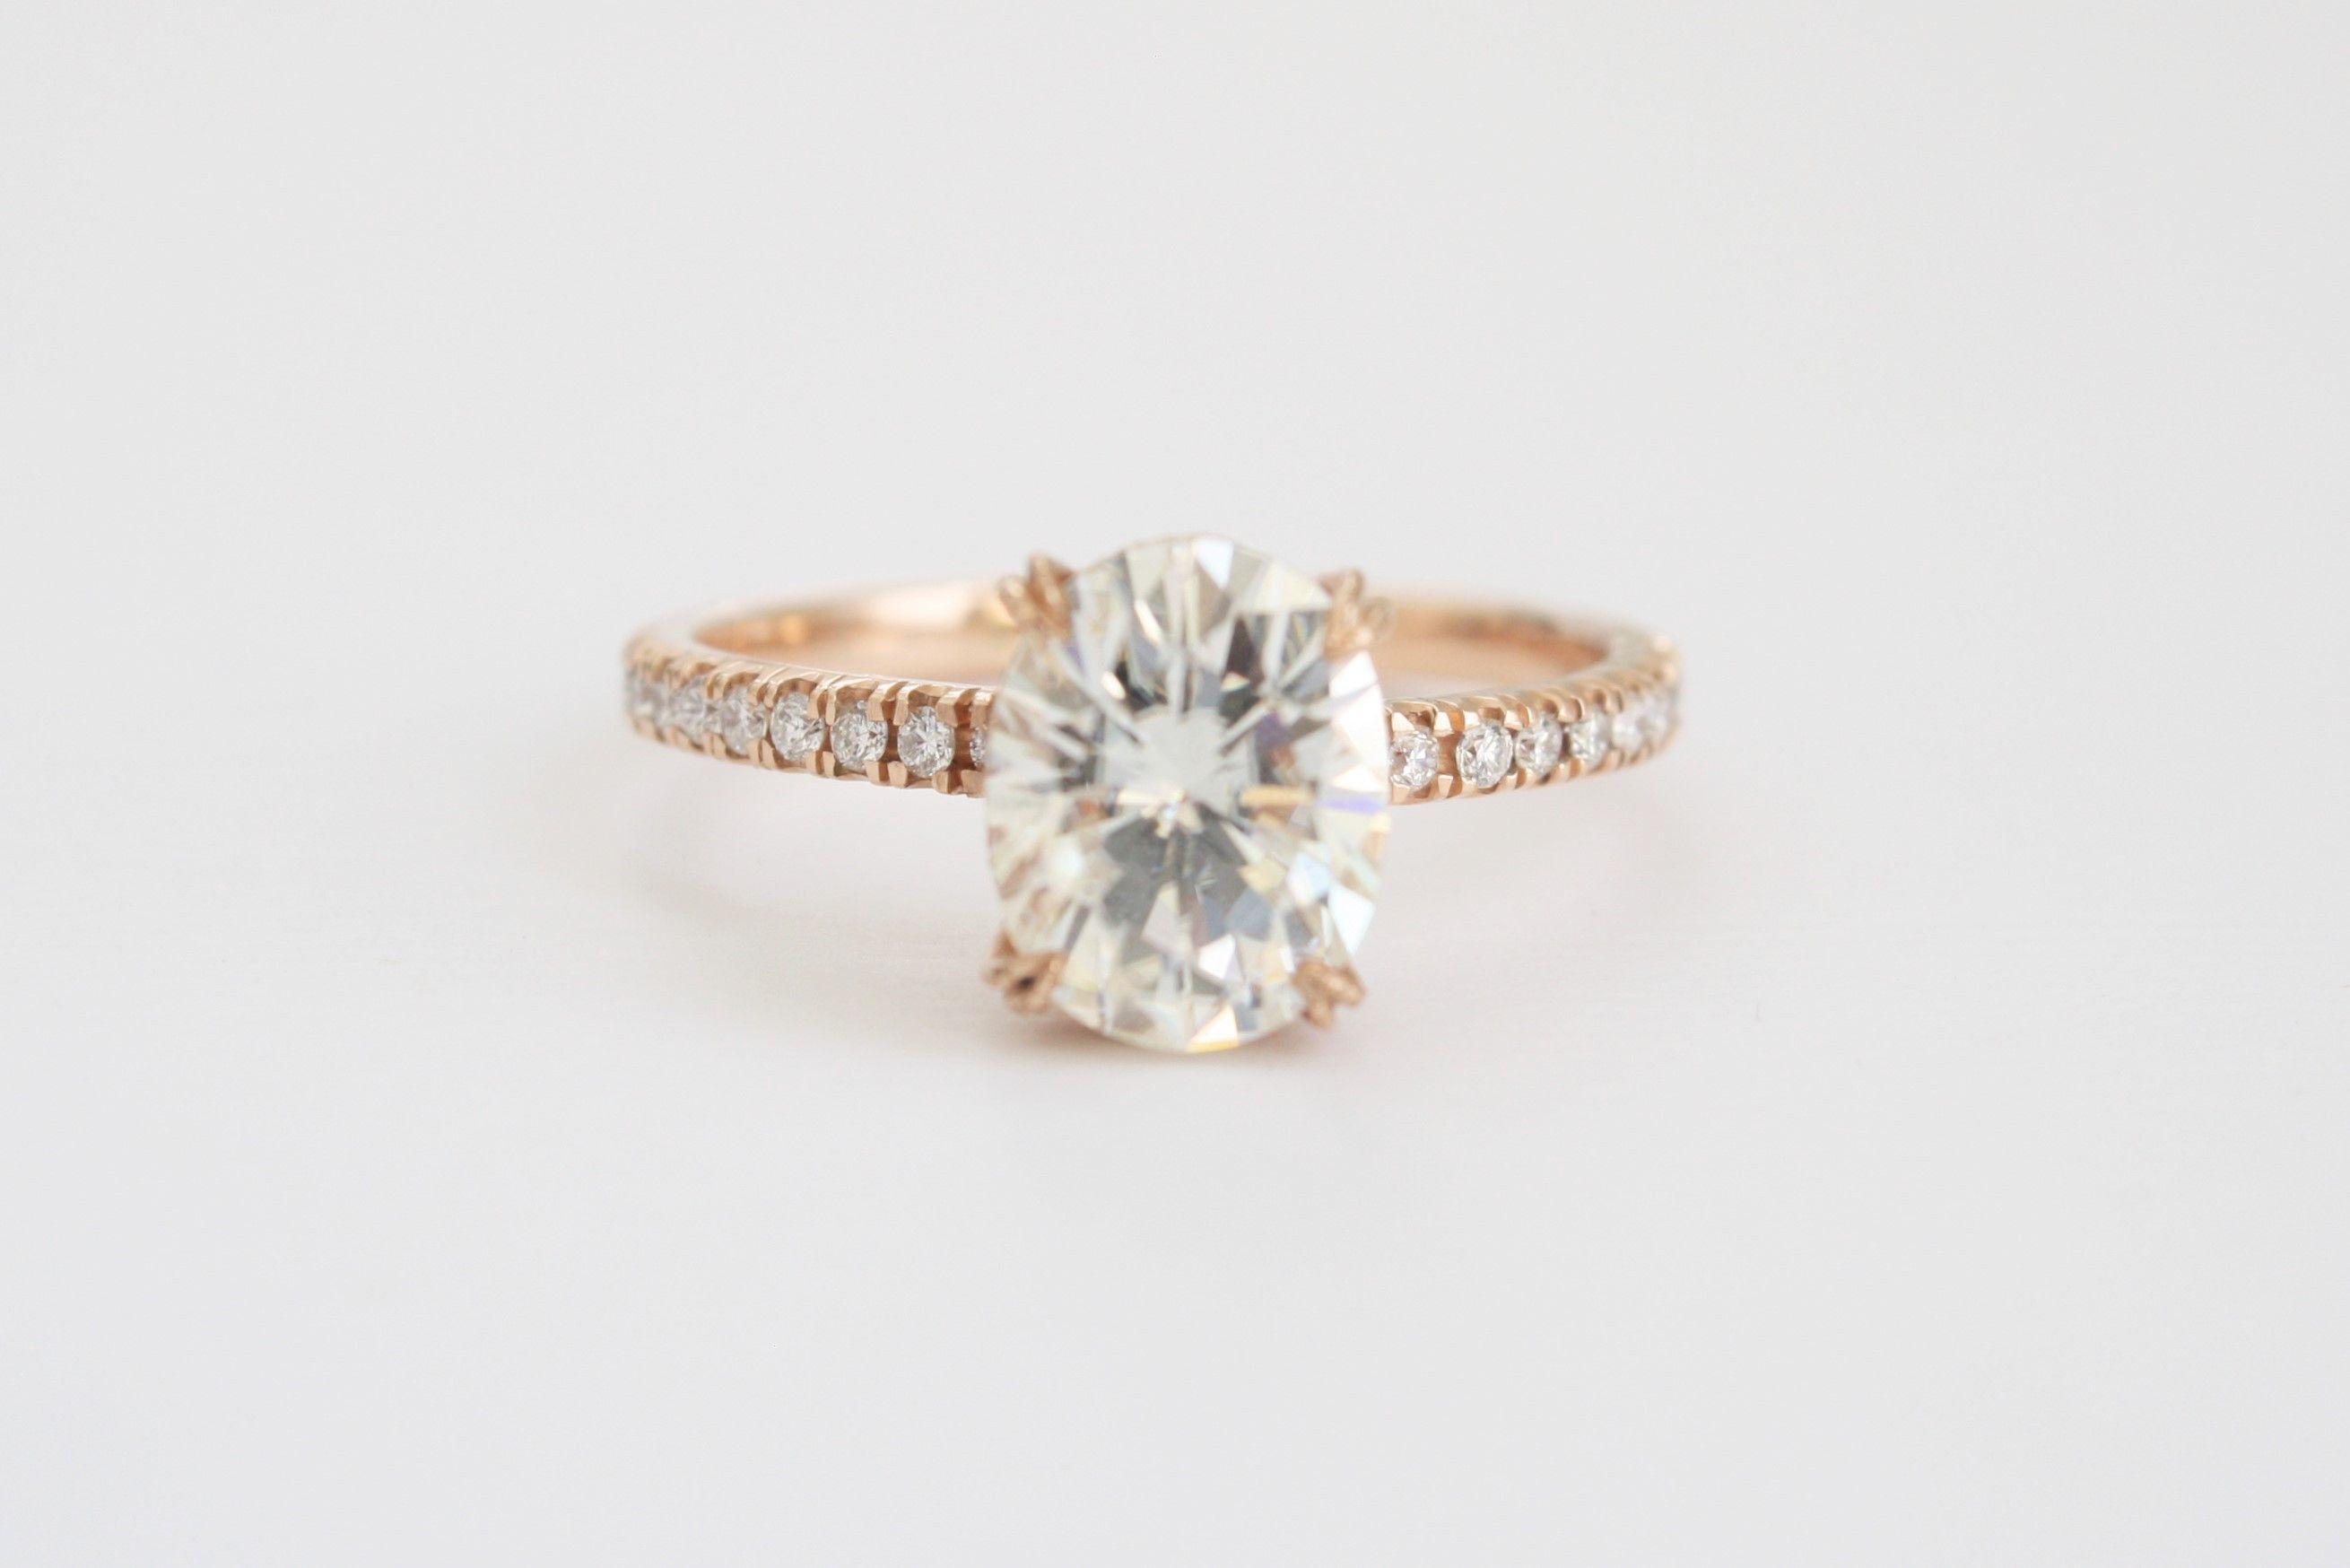 Oval forever brilliant moissanite solitaire diamond engagement ring